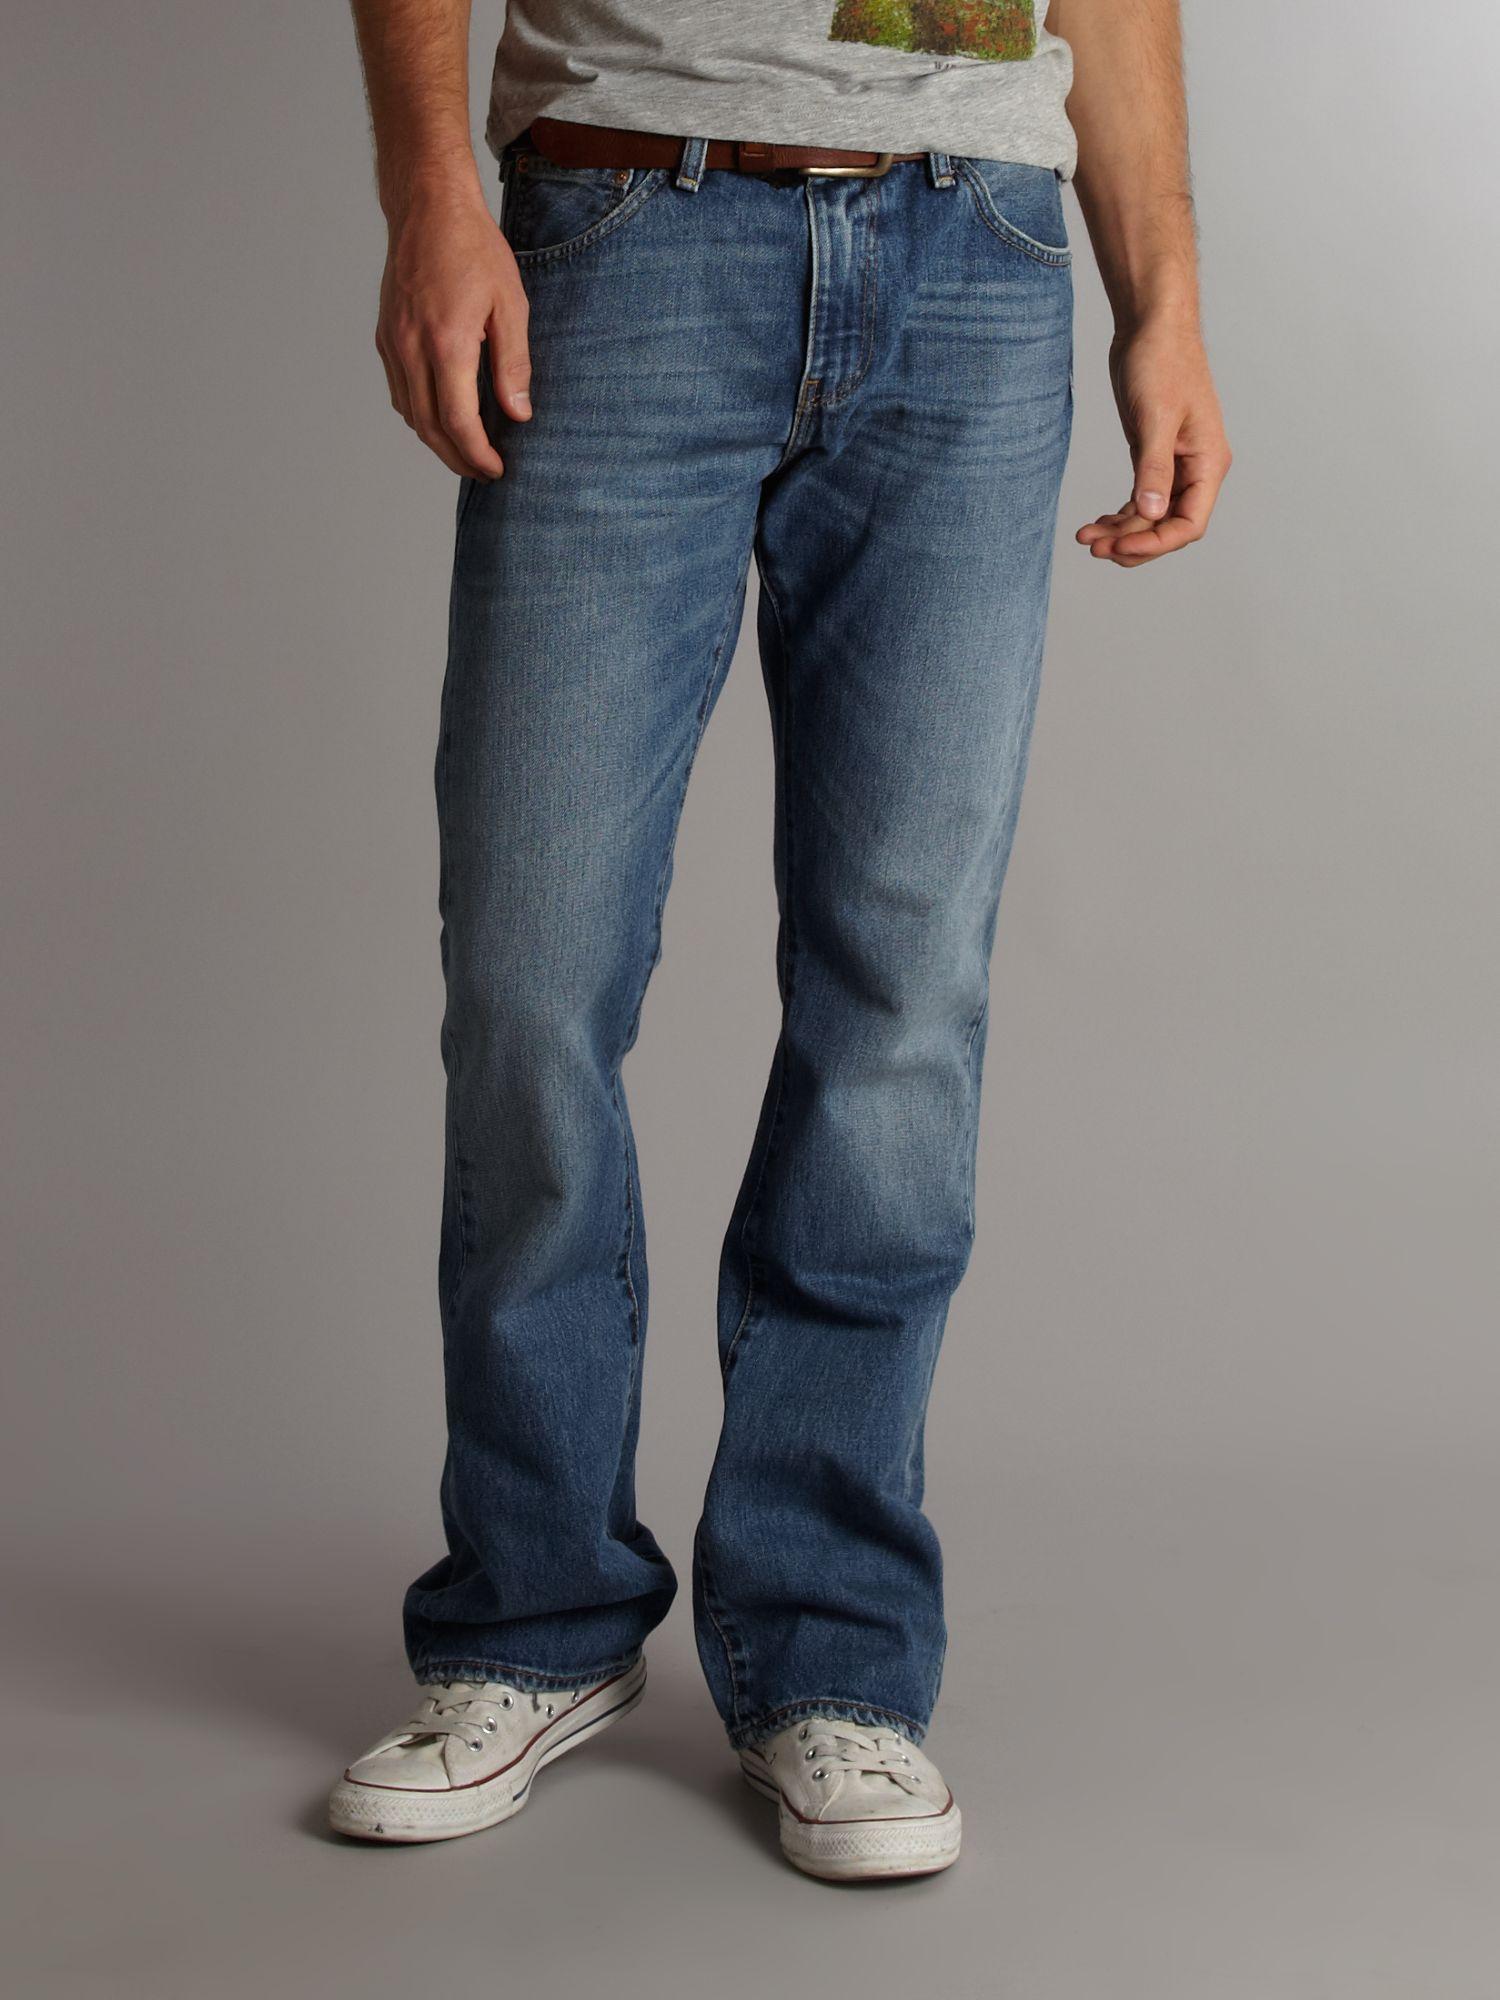 527 bootcut jeans ye jean. Black Bedroom Furniture Sets. Home Design Ideas